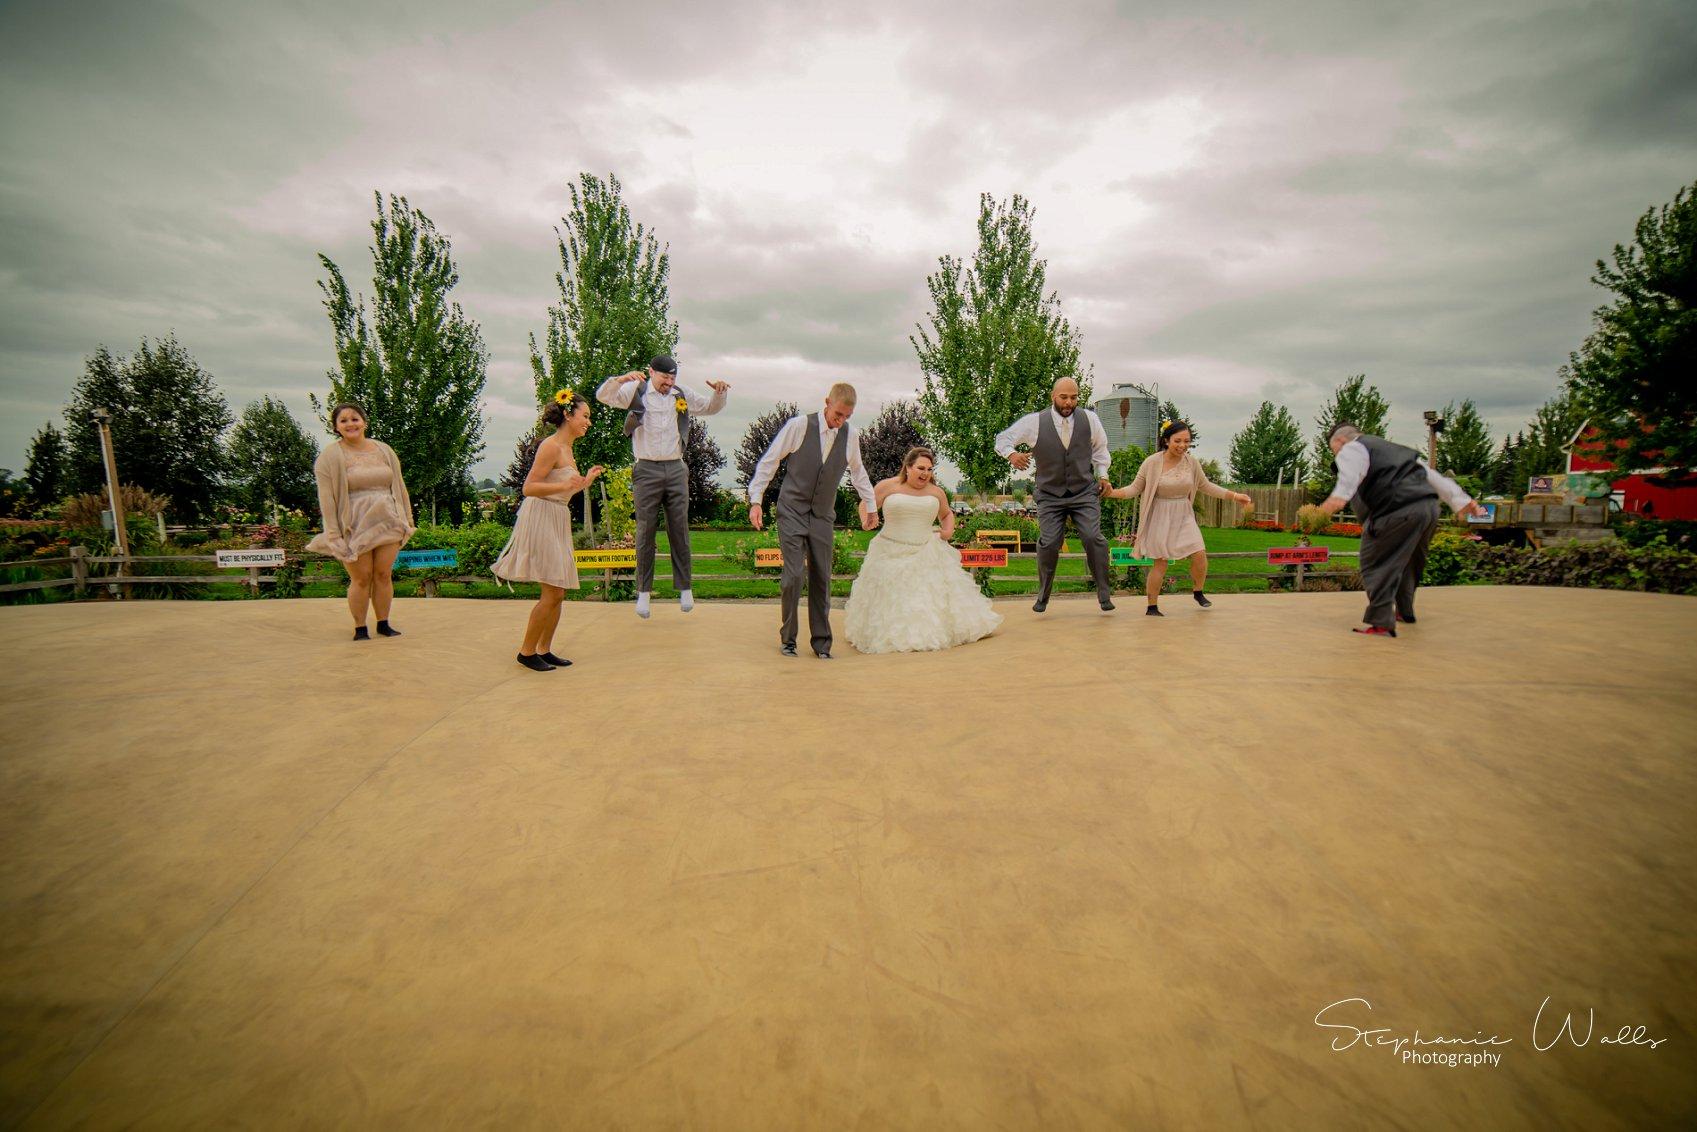 Kimble Wedding 046 Marlena & Allans | Snohomish Red Barn Events (Stocker Farms) | Snohomish, Wa Wedding Photographer